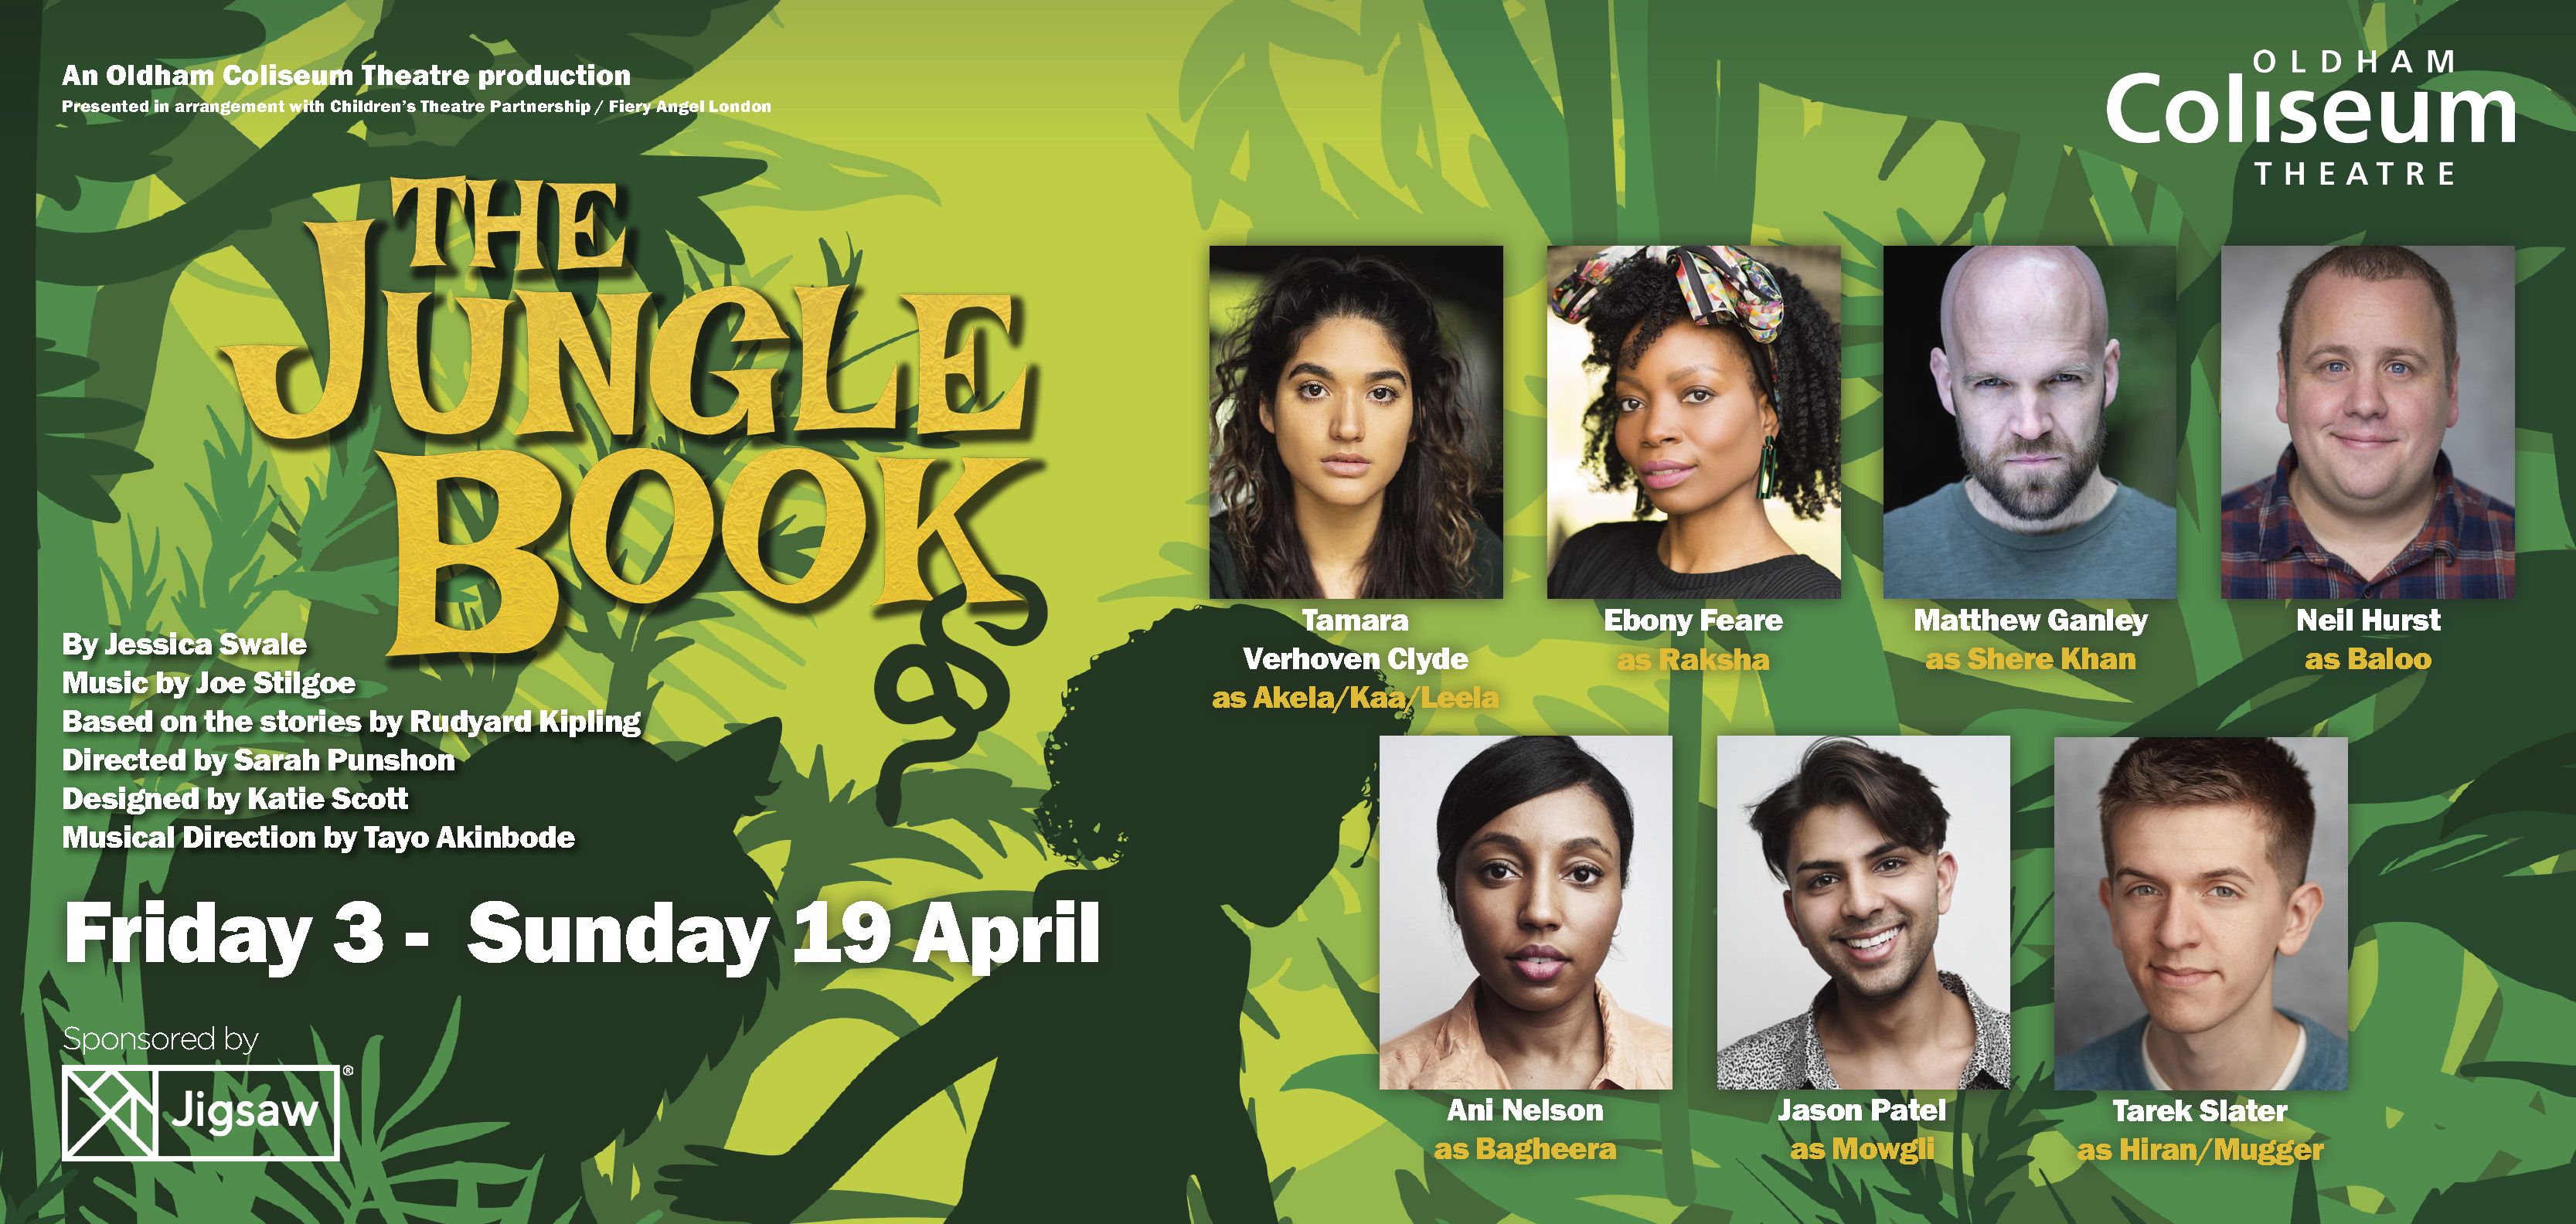 The-Jungle-Book-cast-image